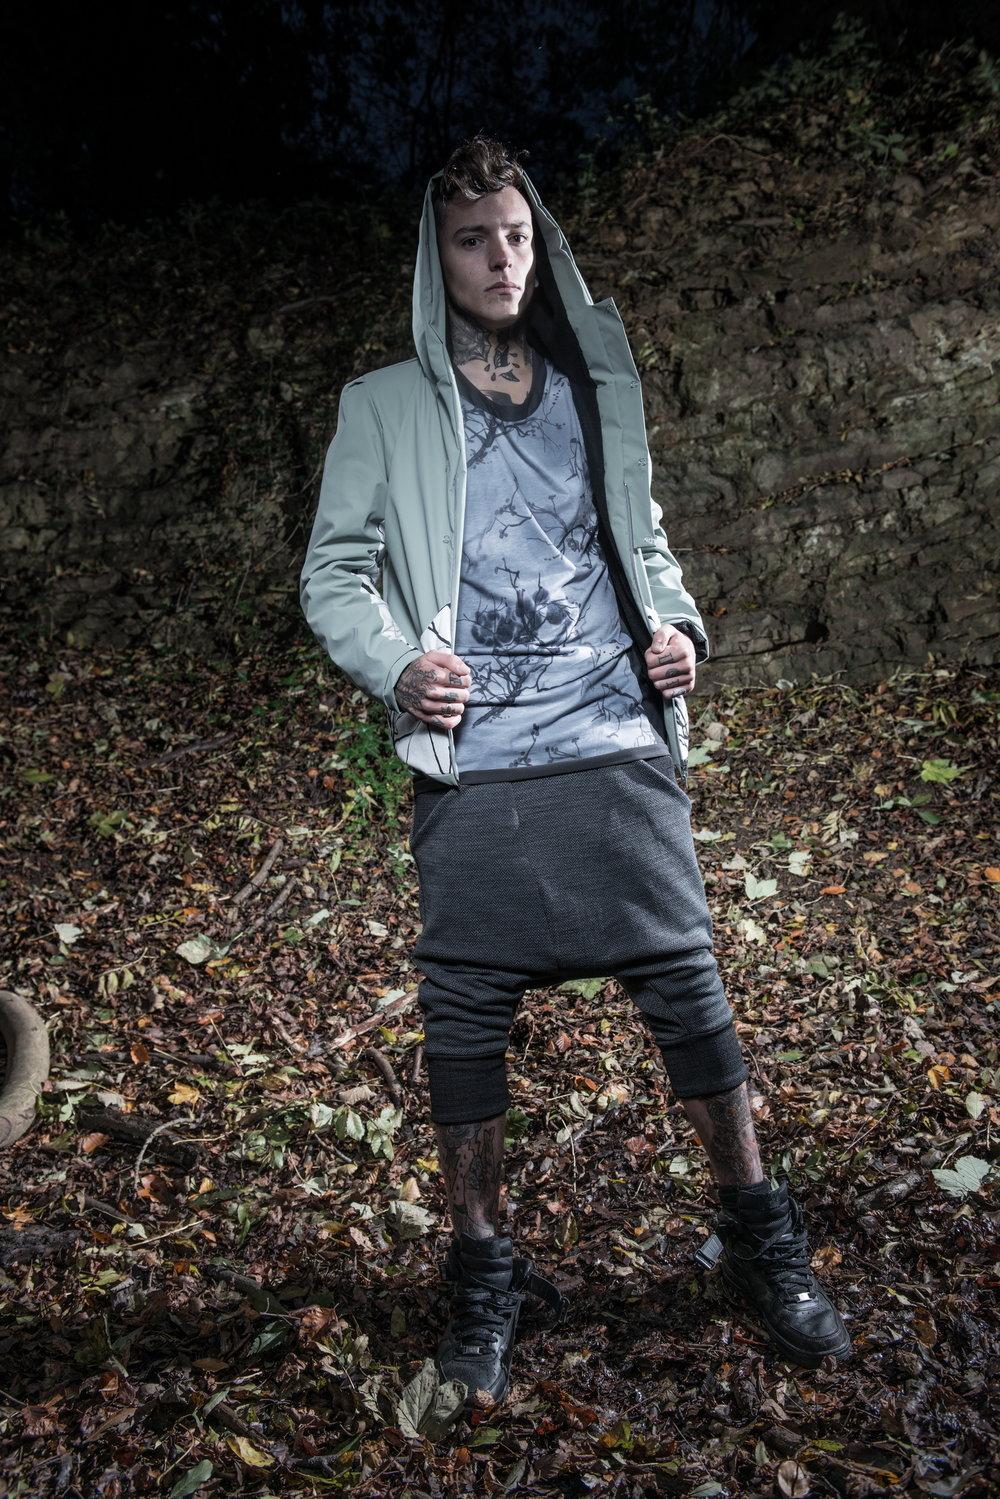 zaramia-ava-zaramiaava-leeds-fashion-designer-ethical-sustainable-tailored-minimalist-versatile-drape-grey-shirt-vest-top-coat-denim-trousers-black-grey-texture-styling-menswear-model--6